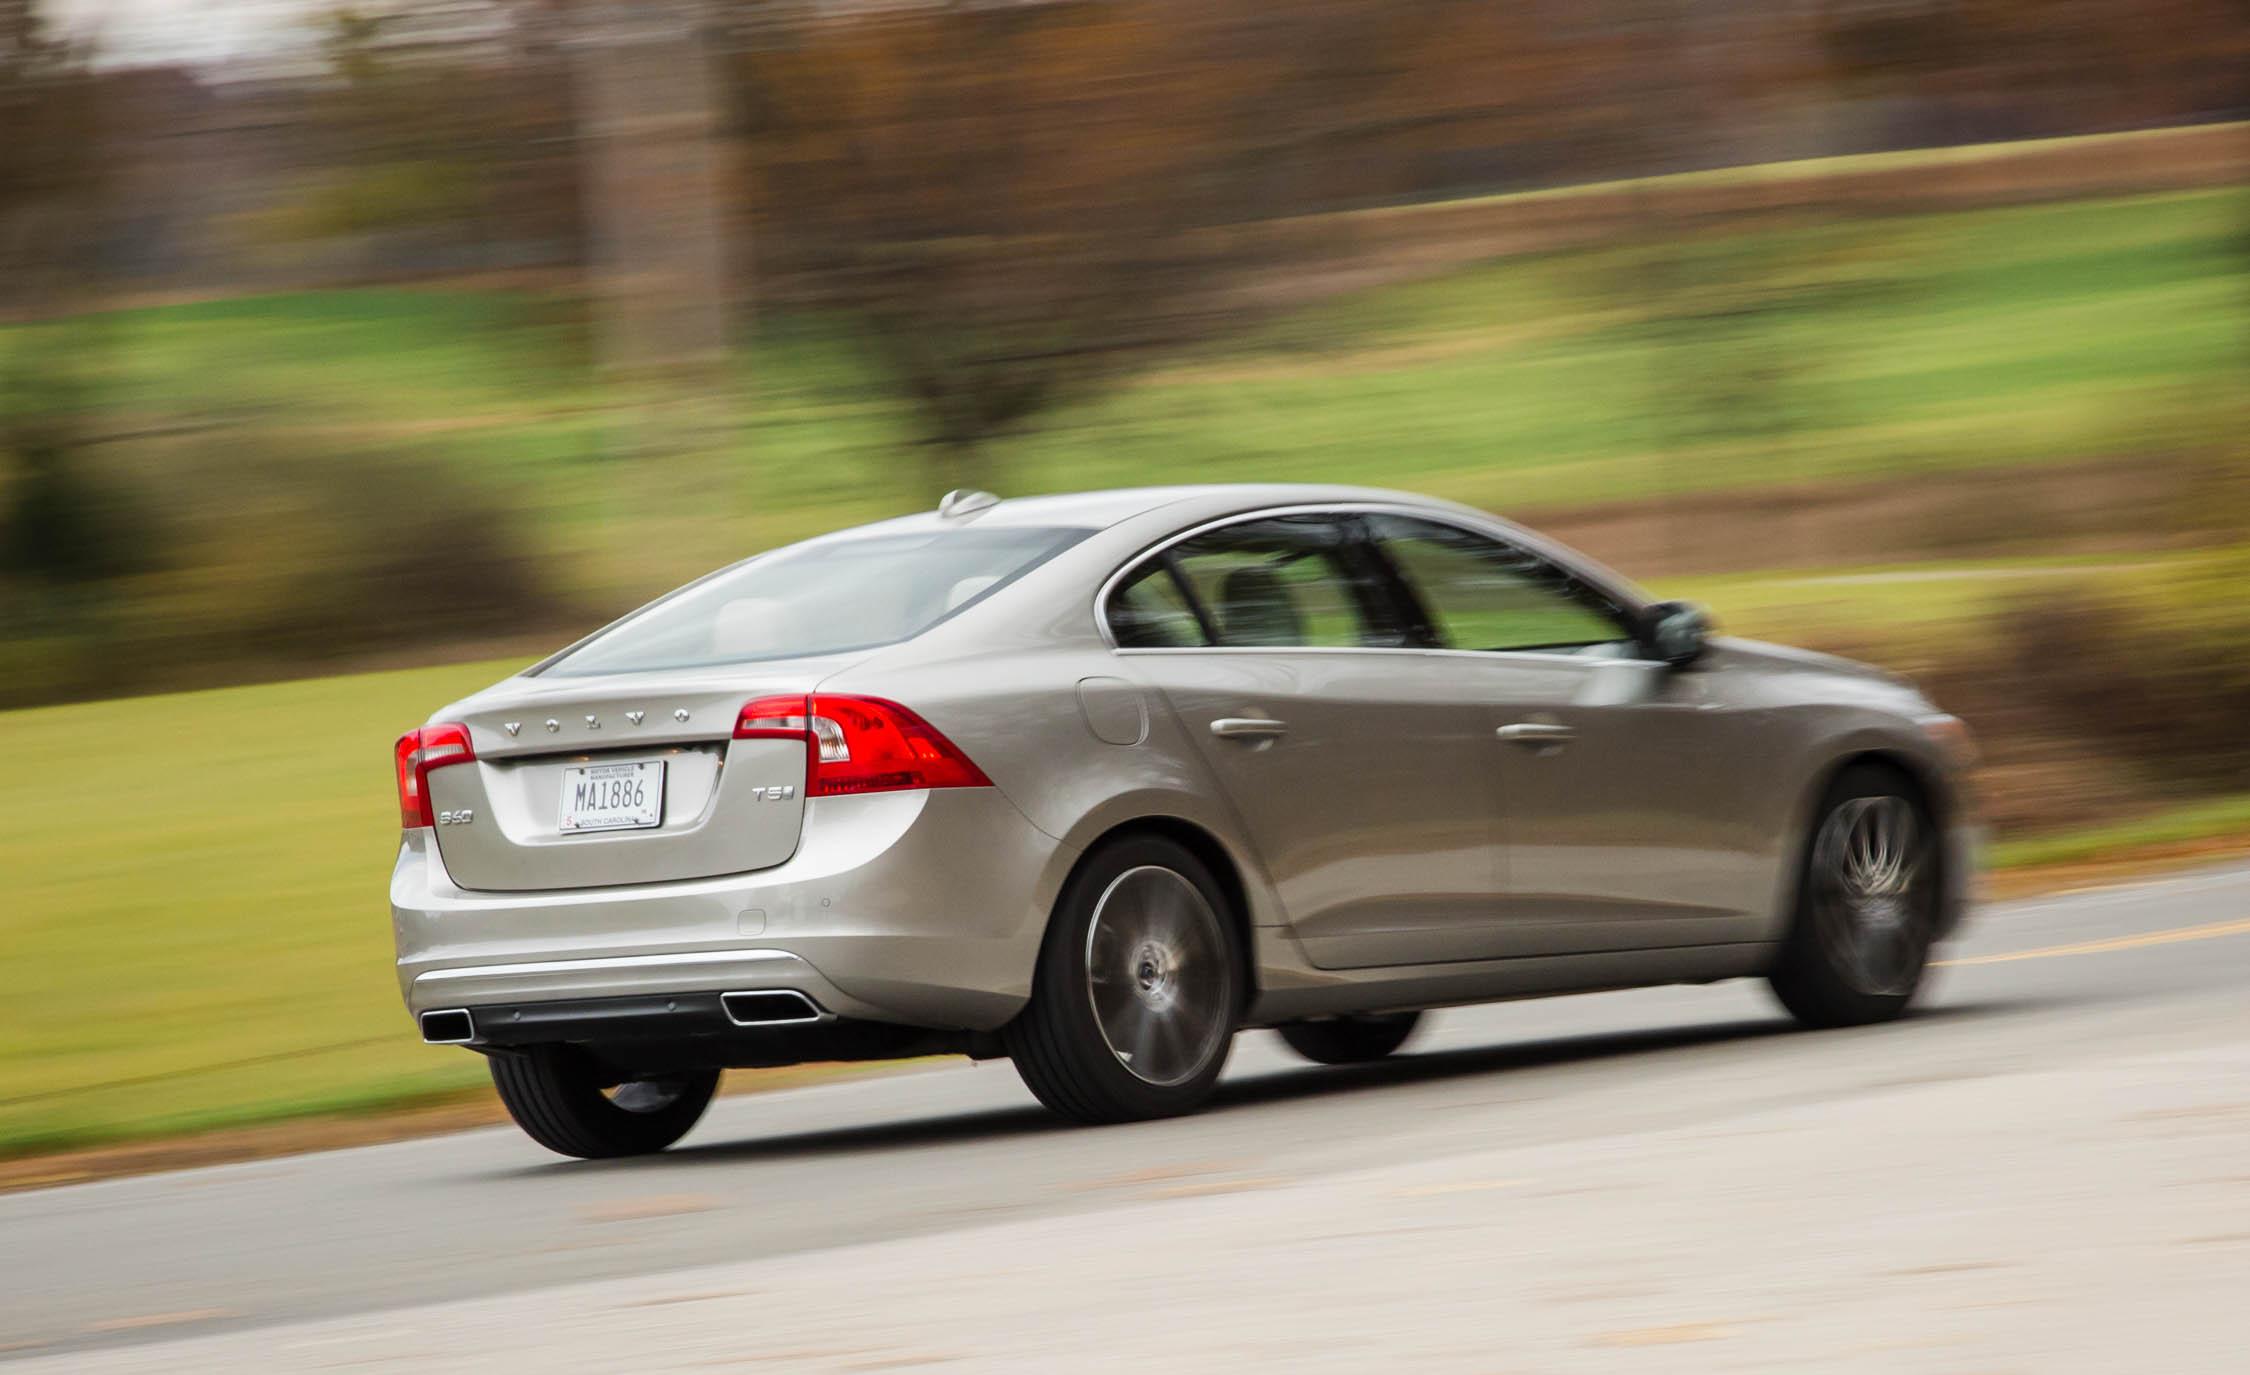 2016 Volvo S60 T5 Inscription Test Rear Side View